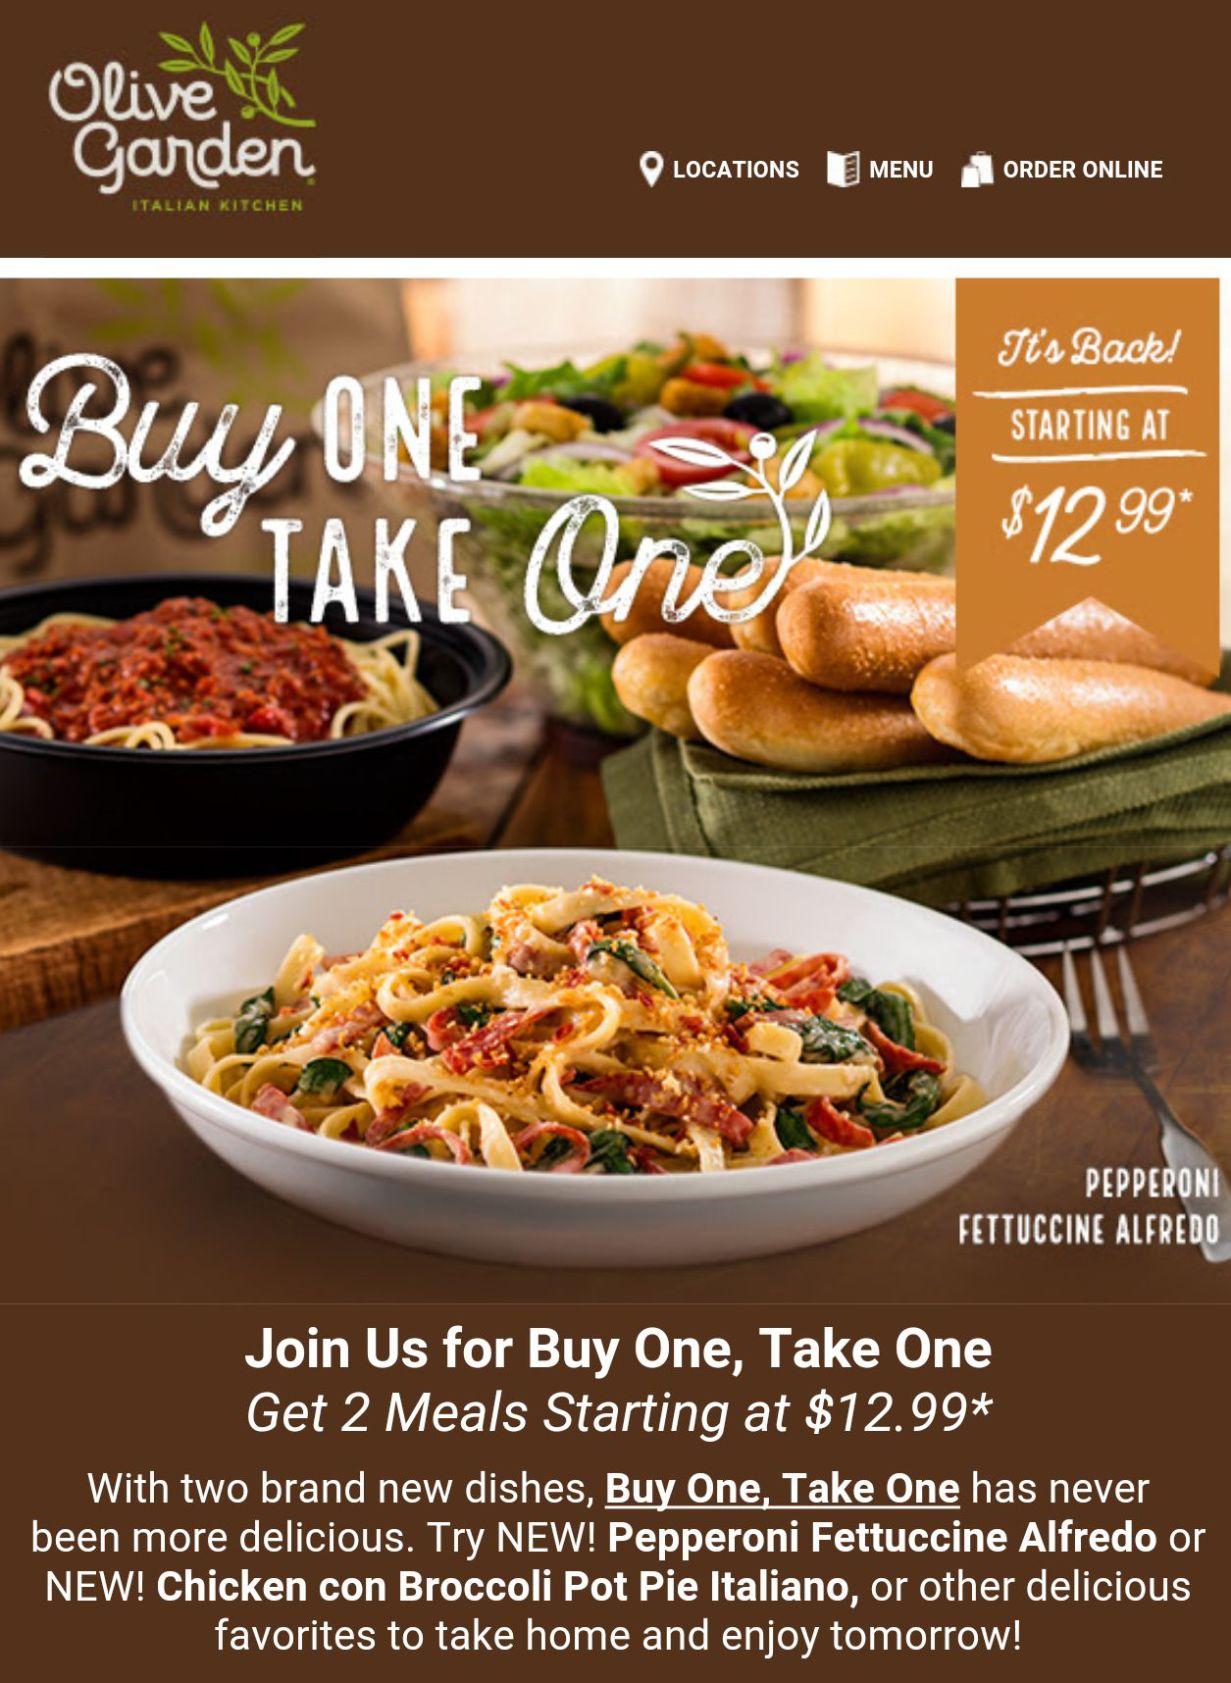 Olive garden order online